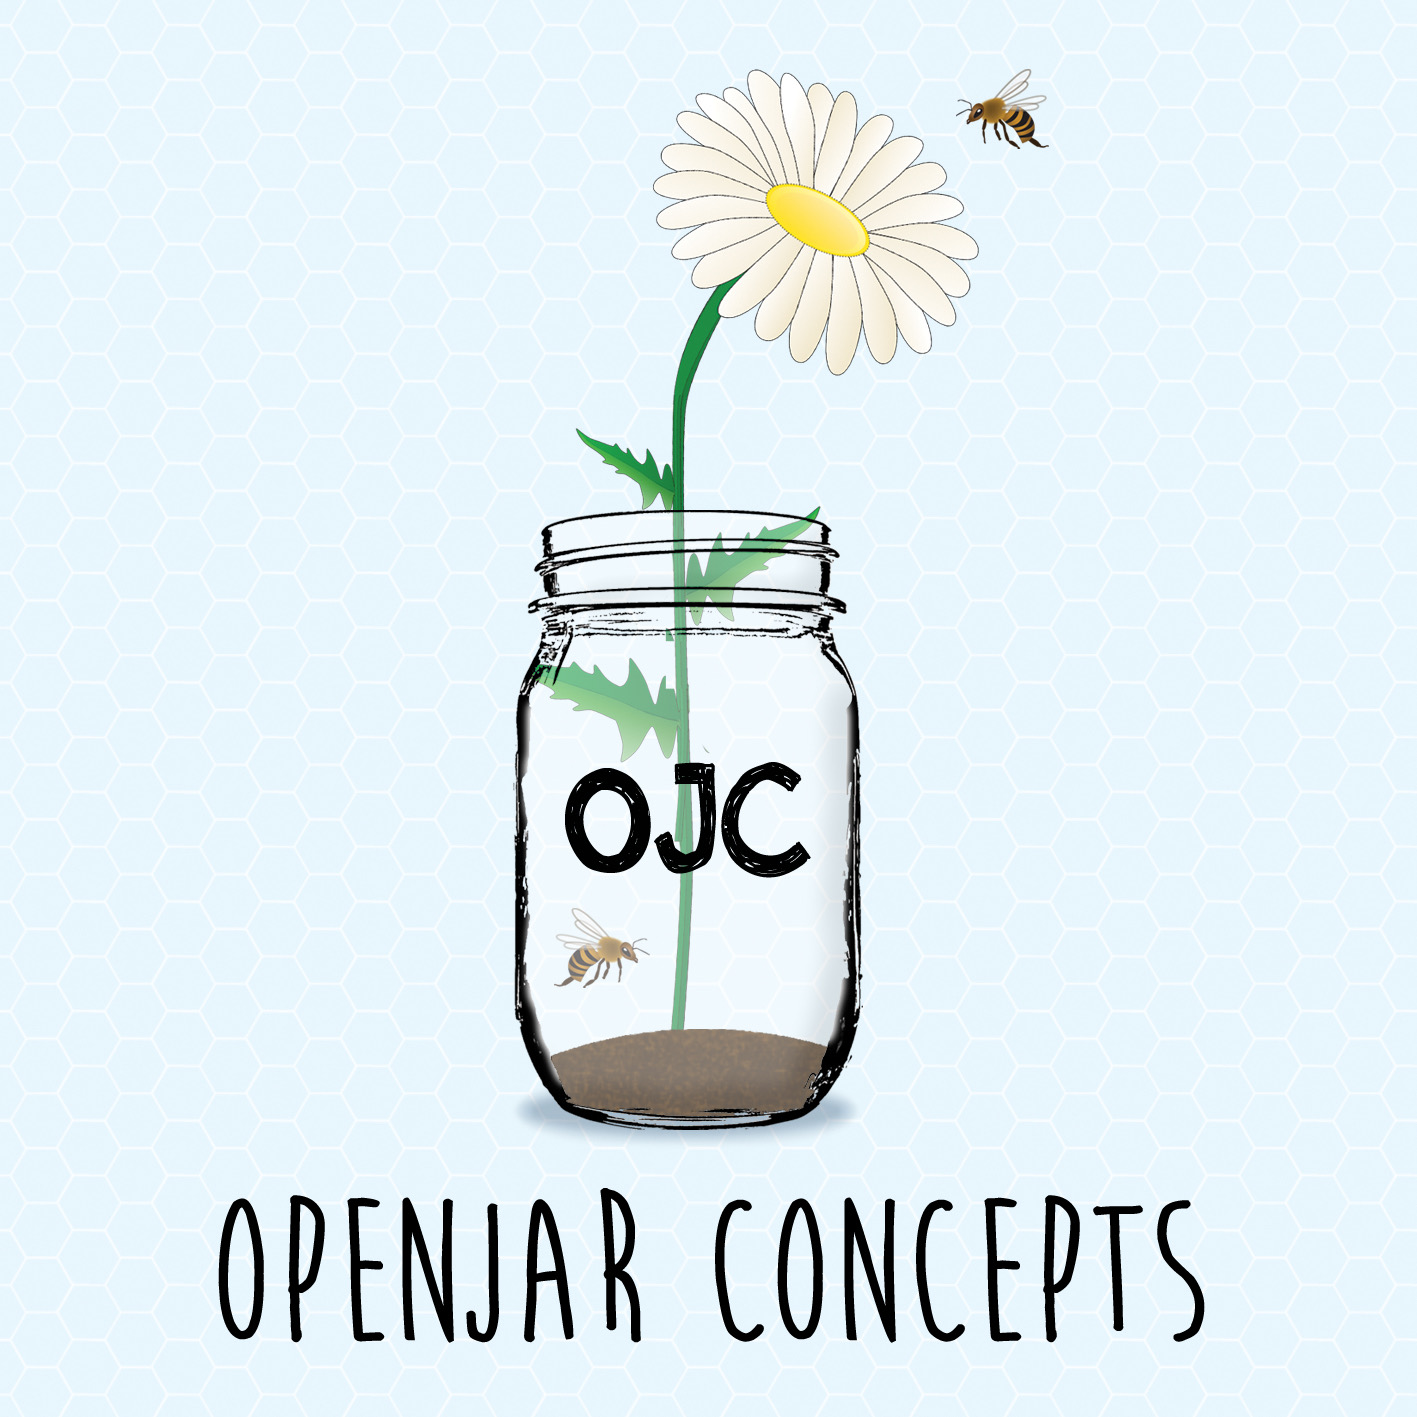 Openjar Concepts